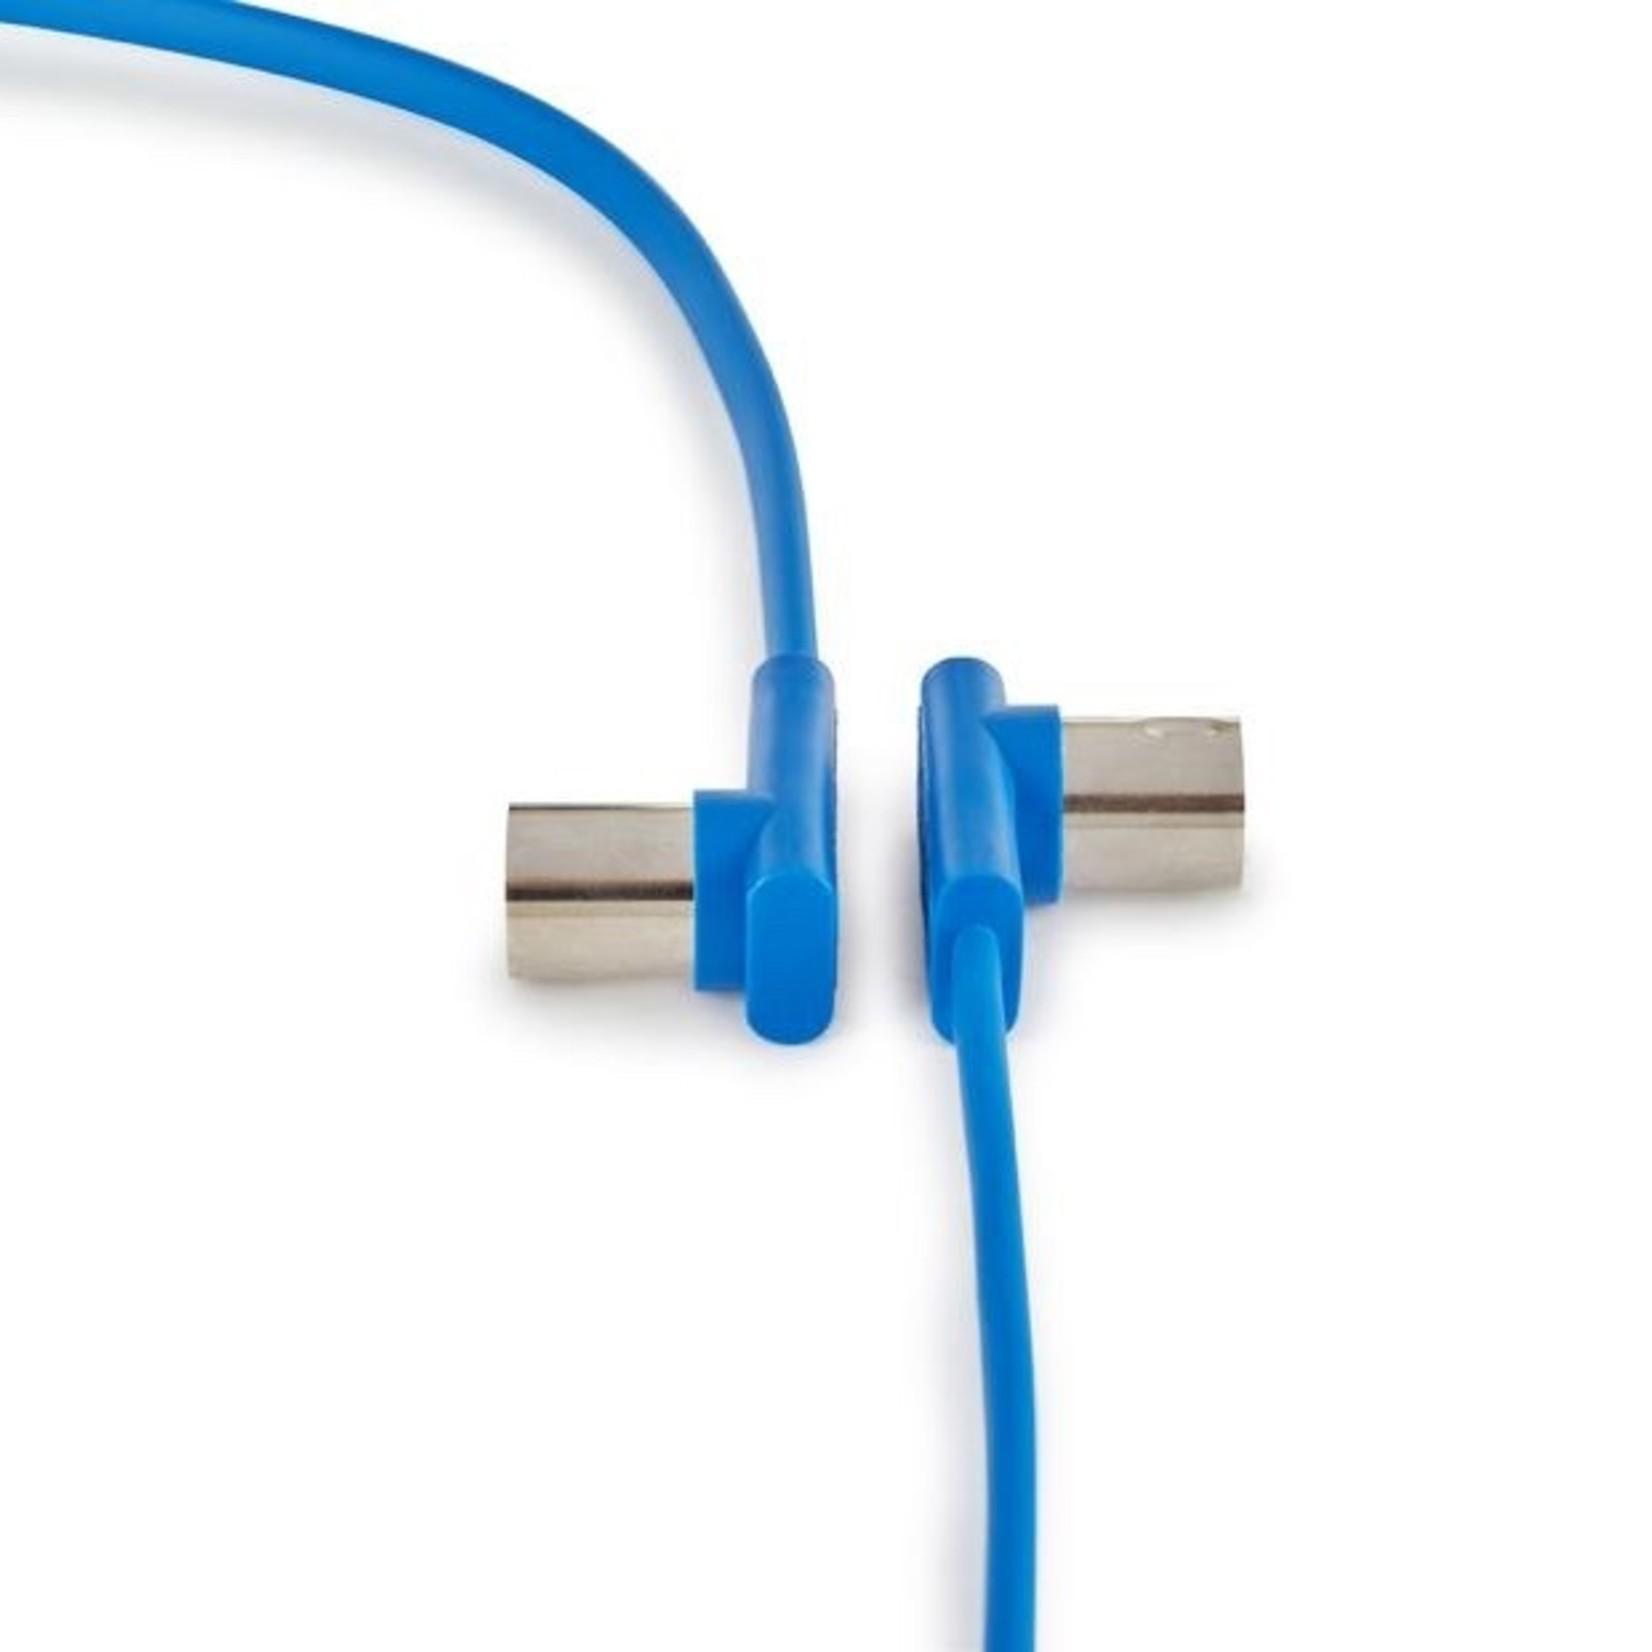 "Rockboard Rockboard Flat MIDI Cable - 30 cm (11 13/16""), Blue, Angled Plugs"